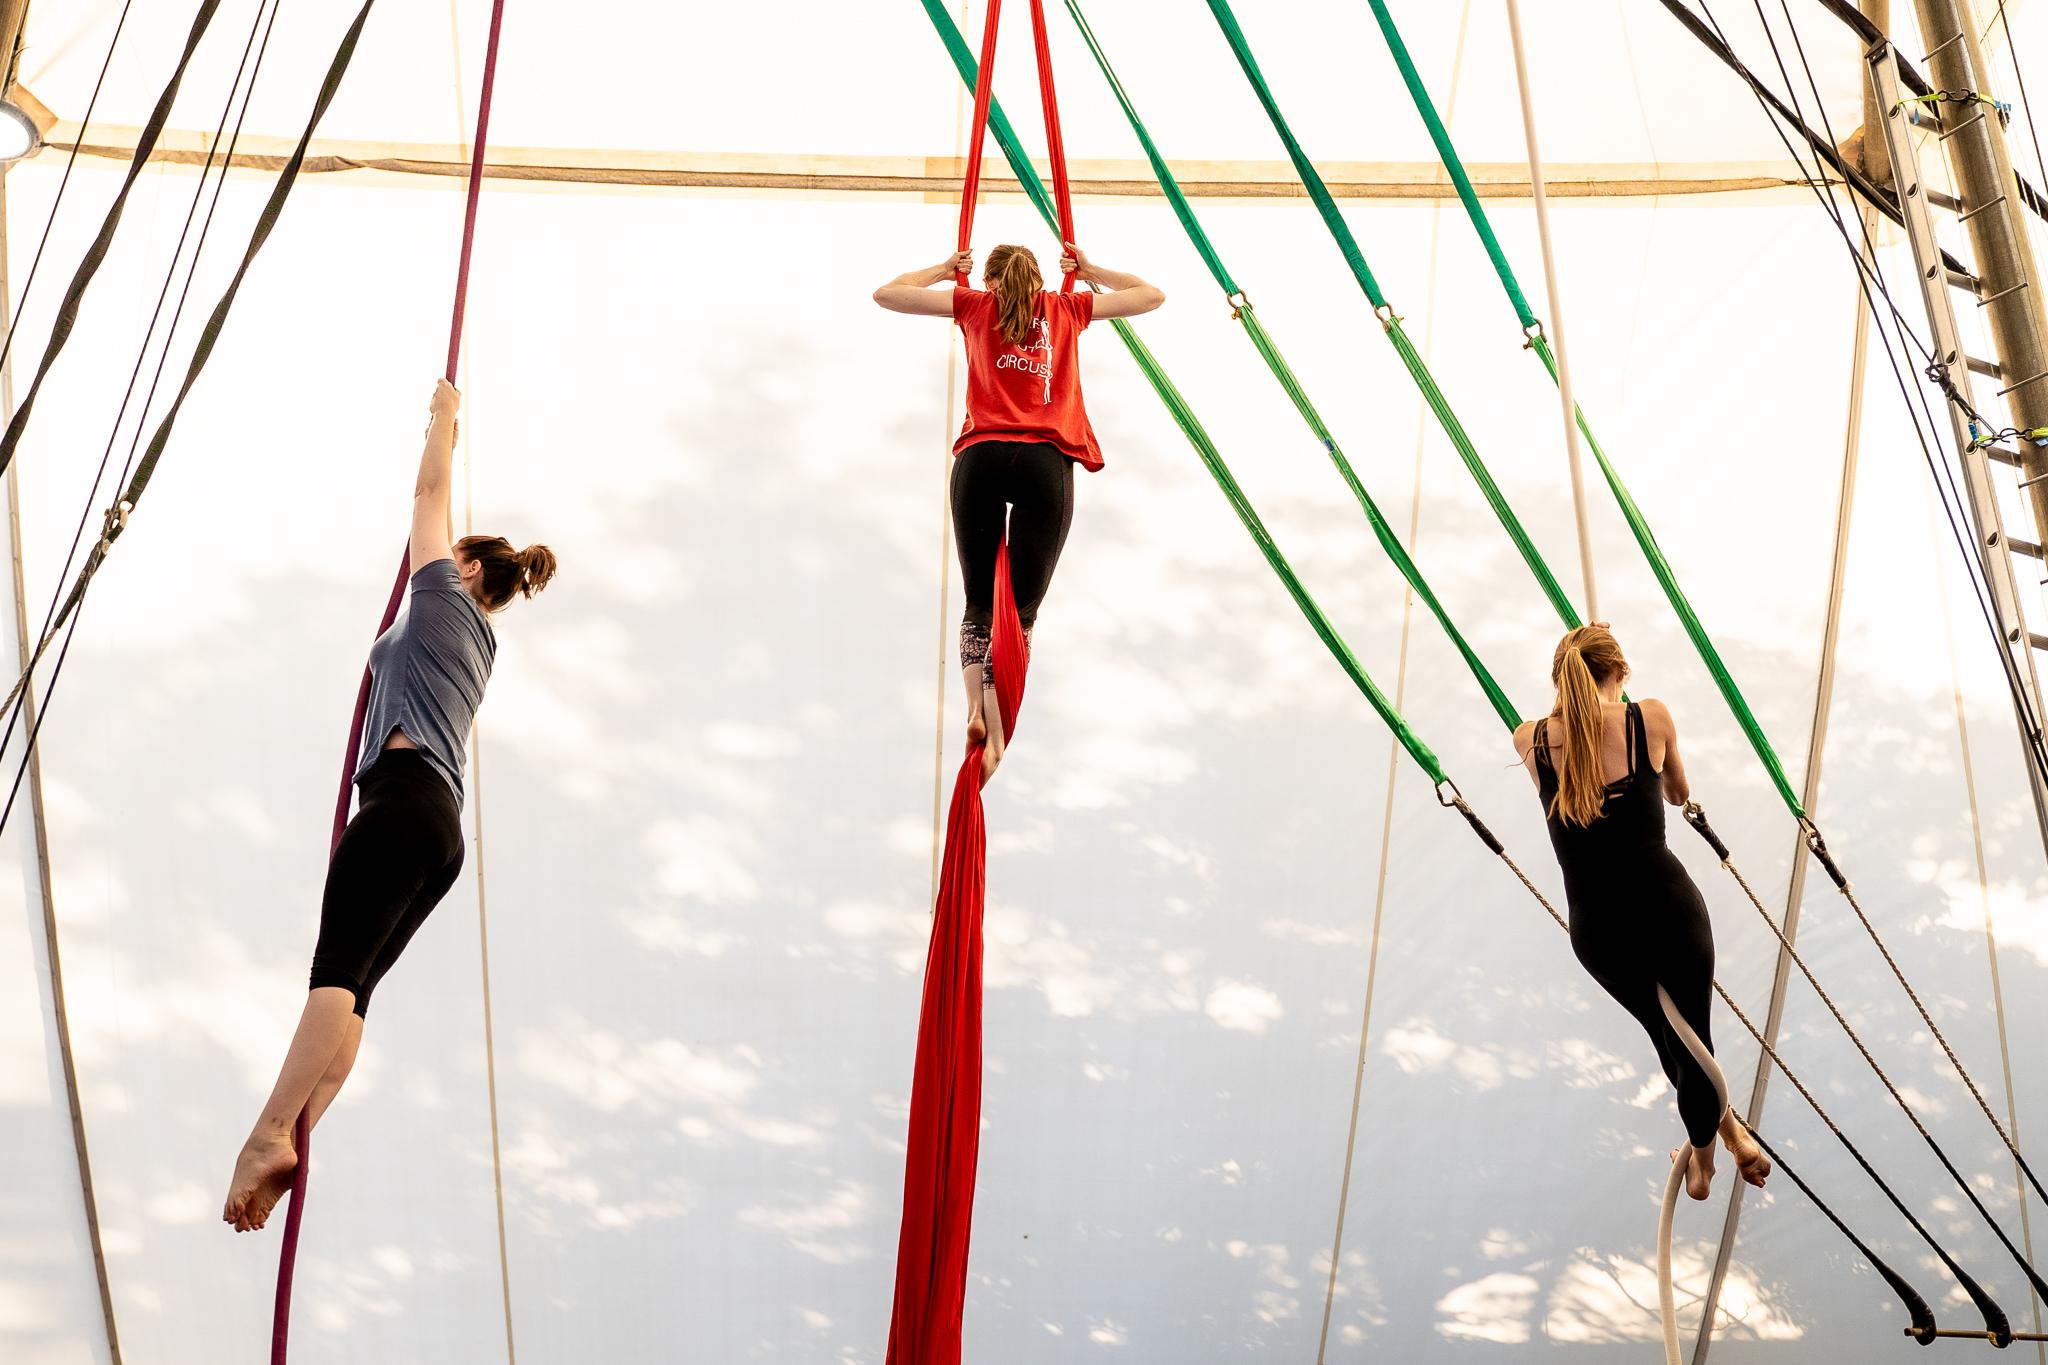 3 people climb aerial apparatus'